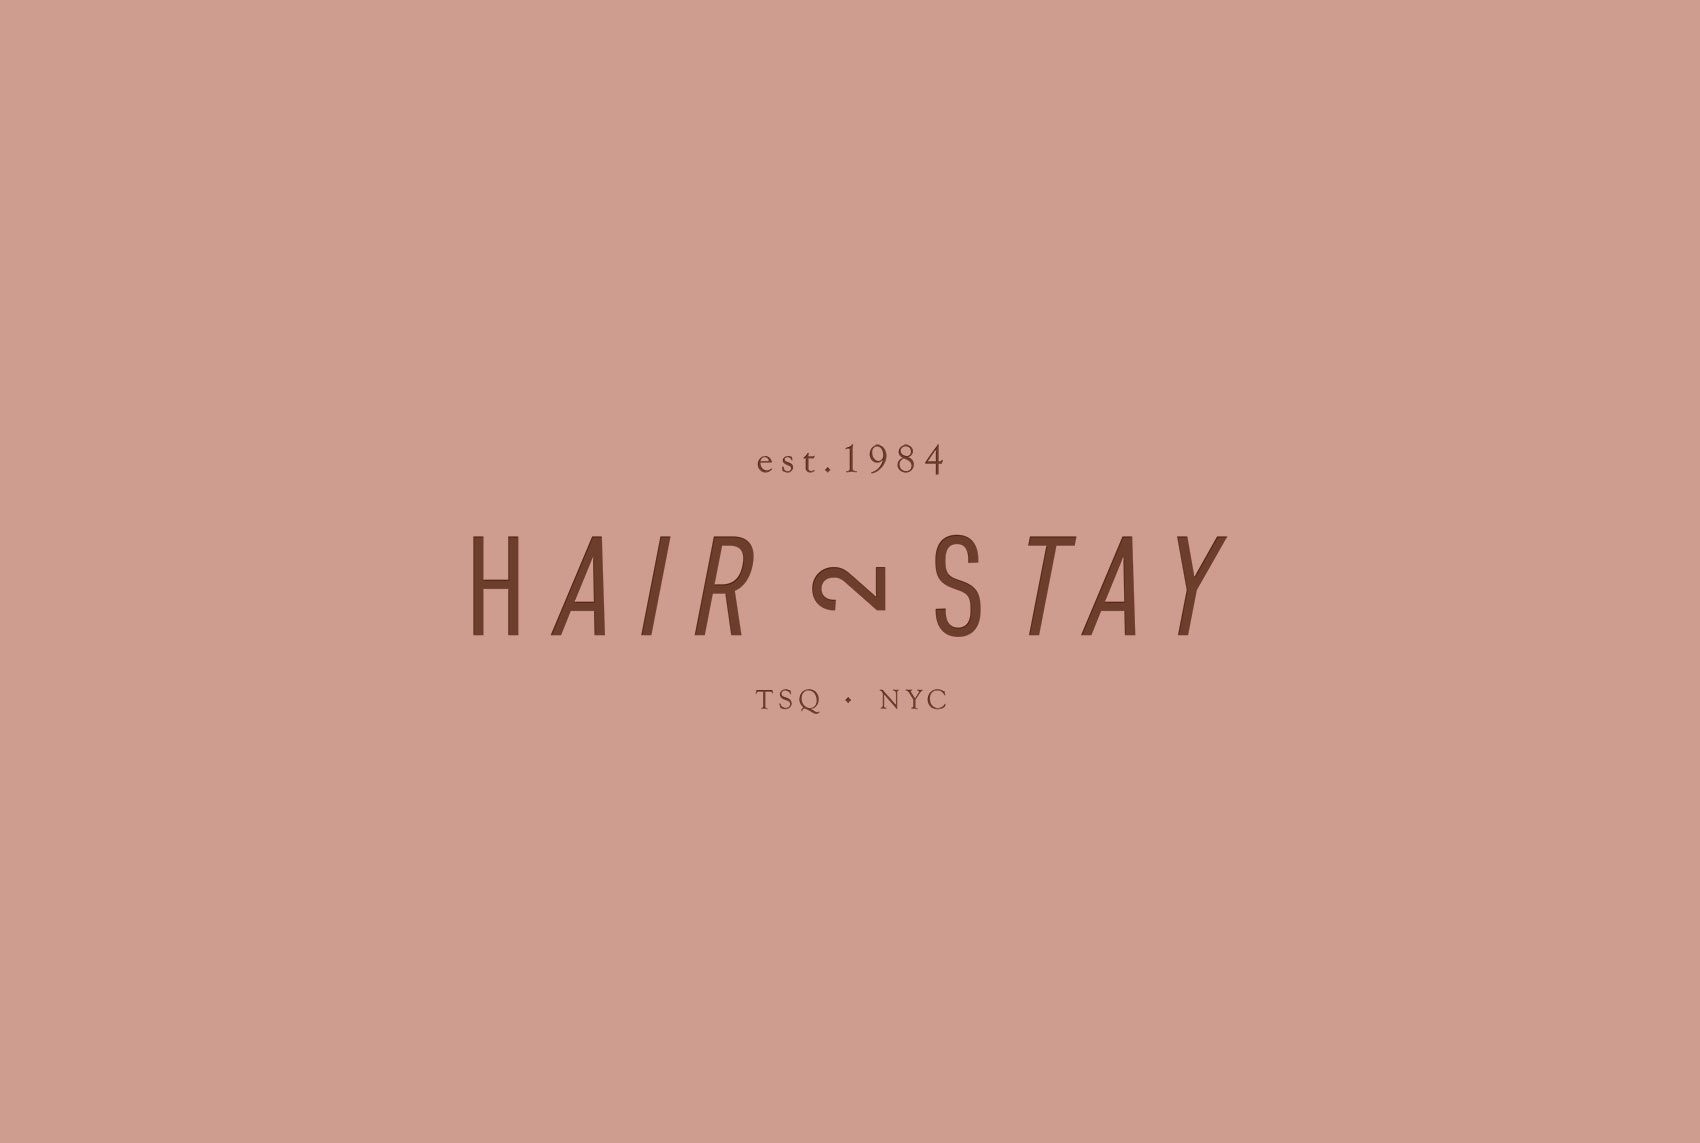 Hair-Salon-Logo-Stationary-Design-LoolaaDesigns-1.jpg